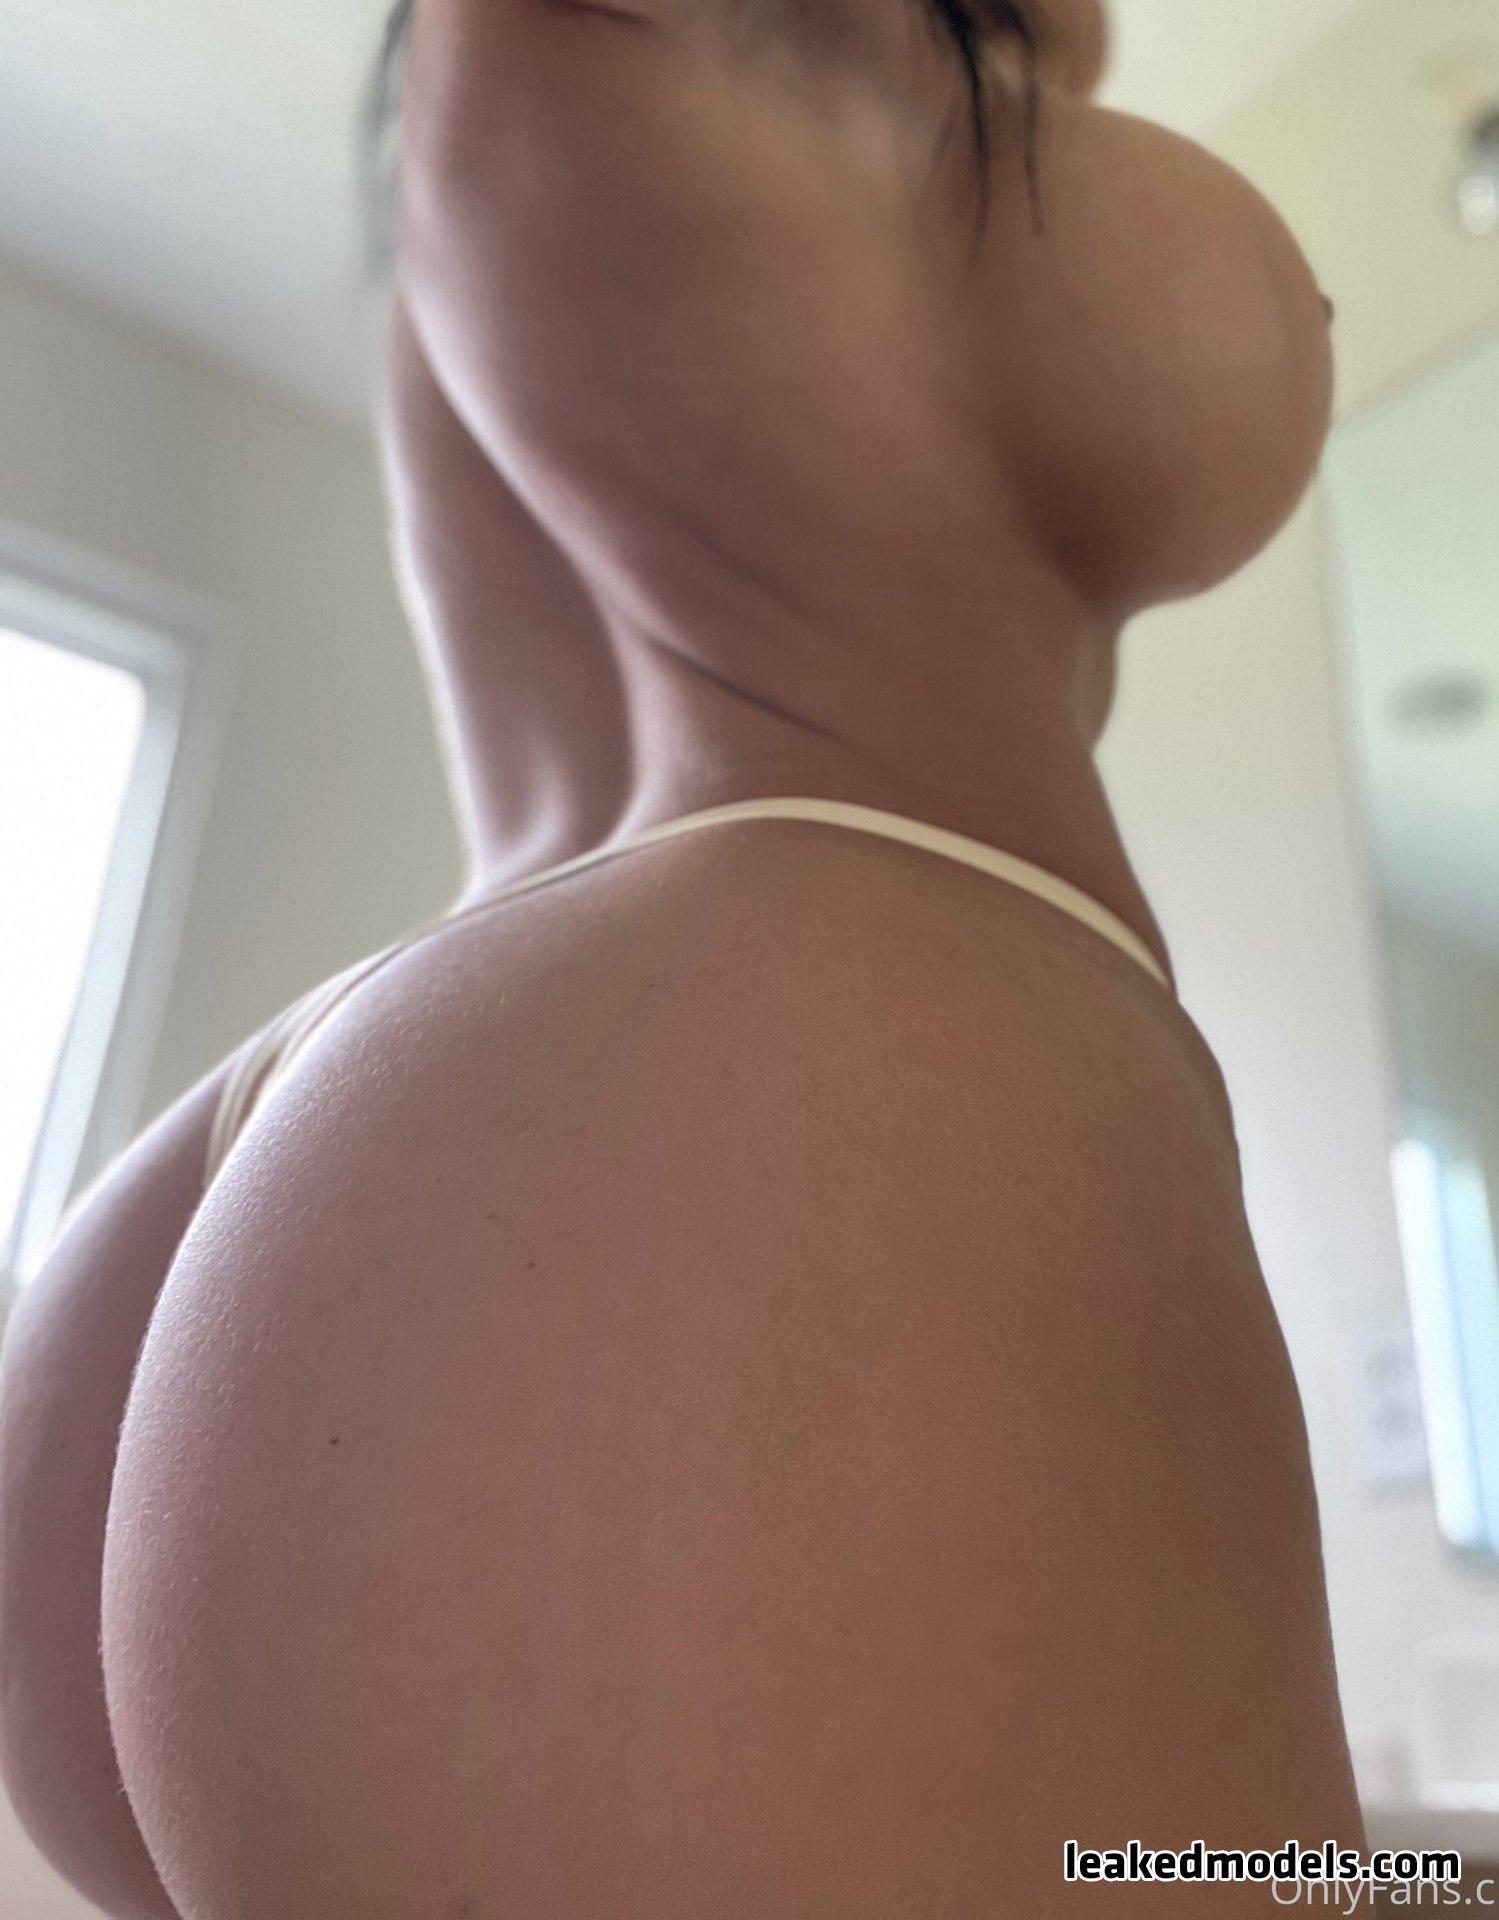 Camila Cruz  – camilacruzzbb OnlyFans Nude Leaks (35 Photos)